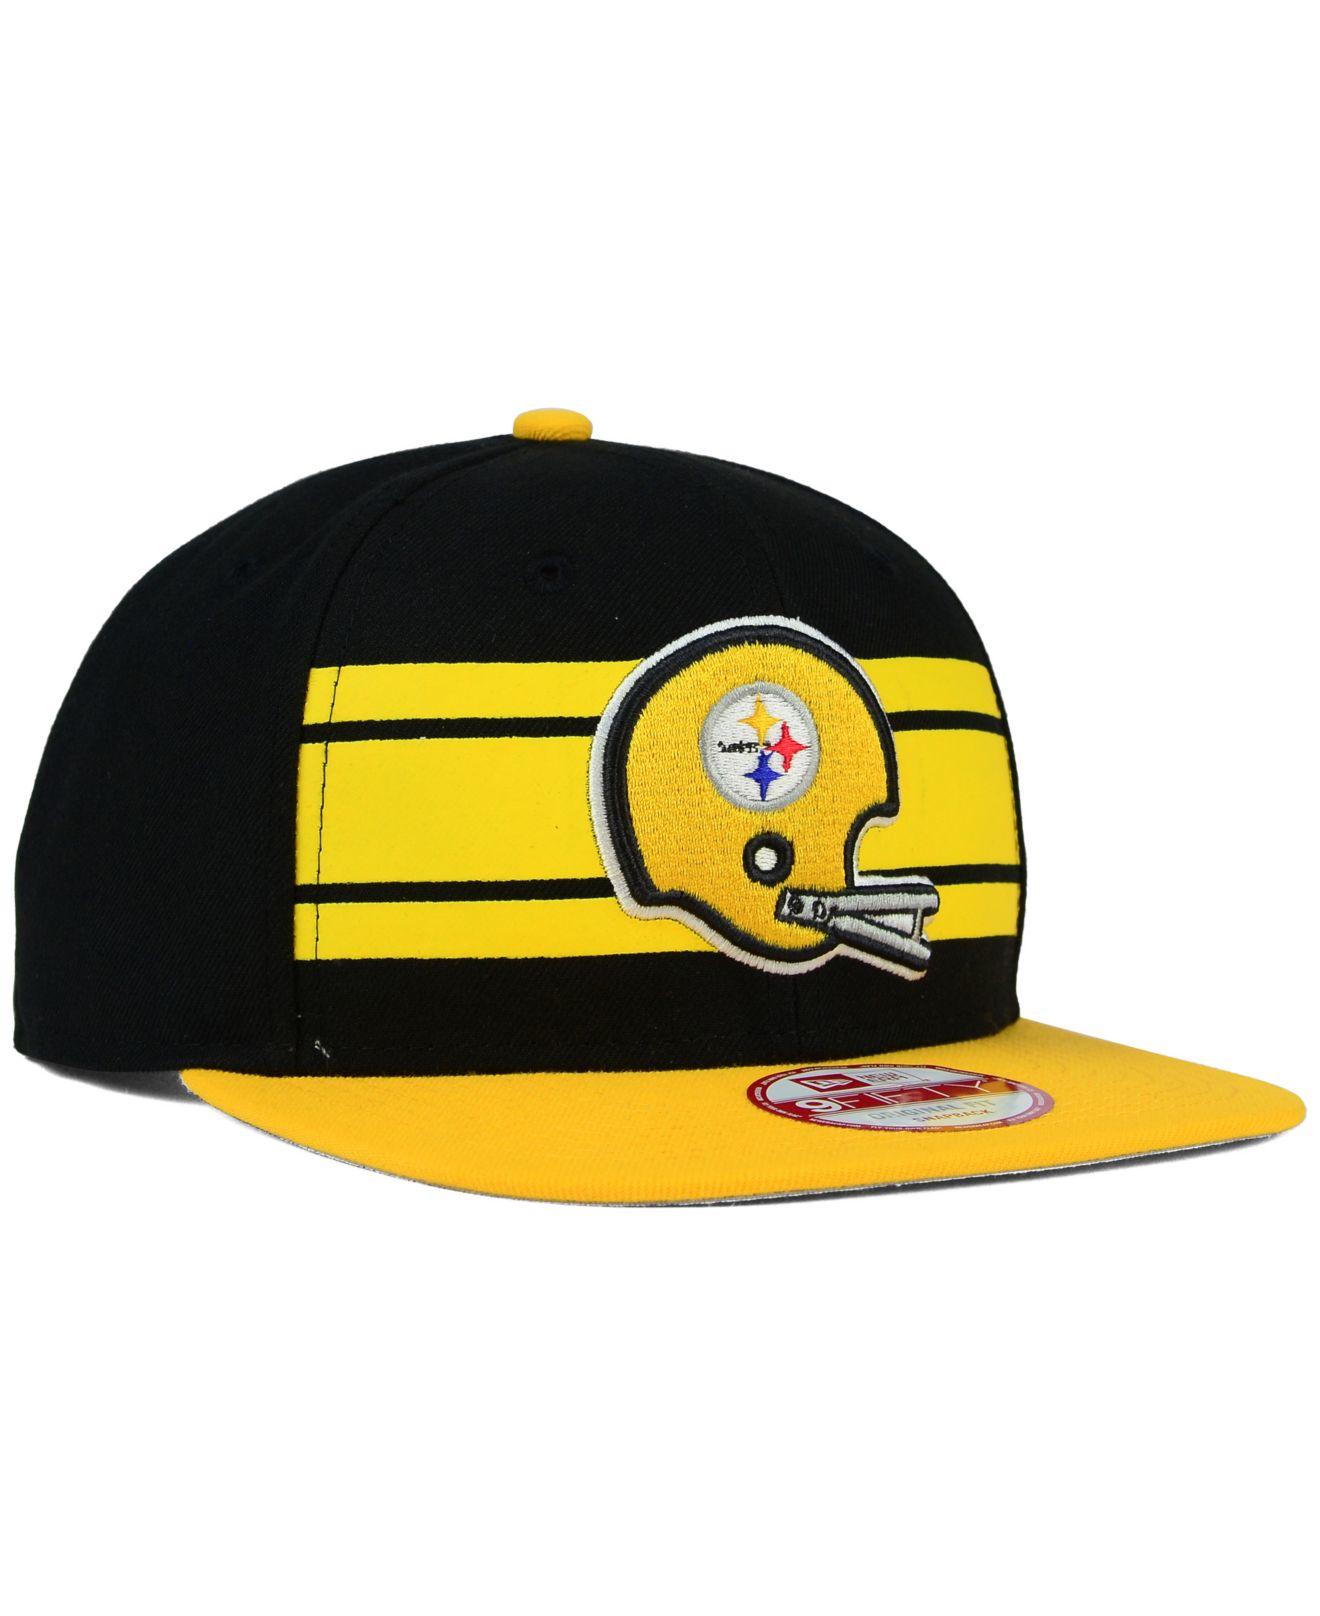 f6090c581fc Lyst - KTZ Pittsburgh Steelers Retro Striped 9fifty Snapback Cap in ...